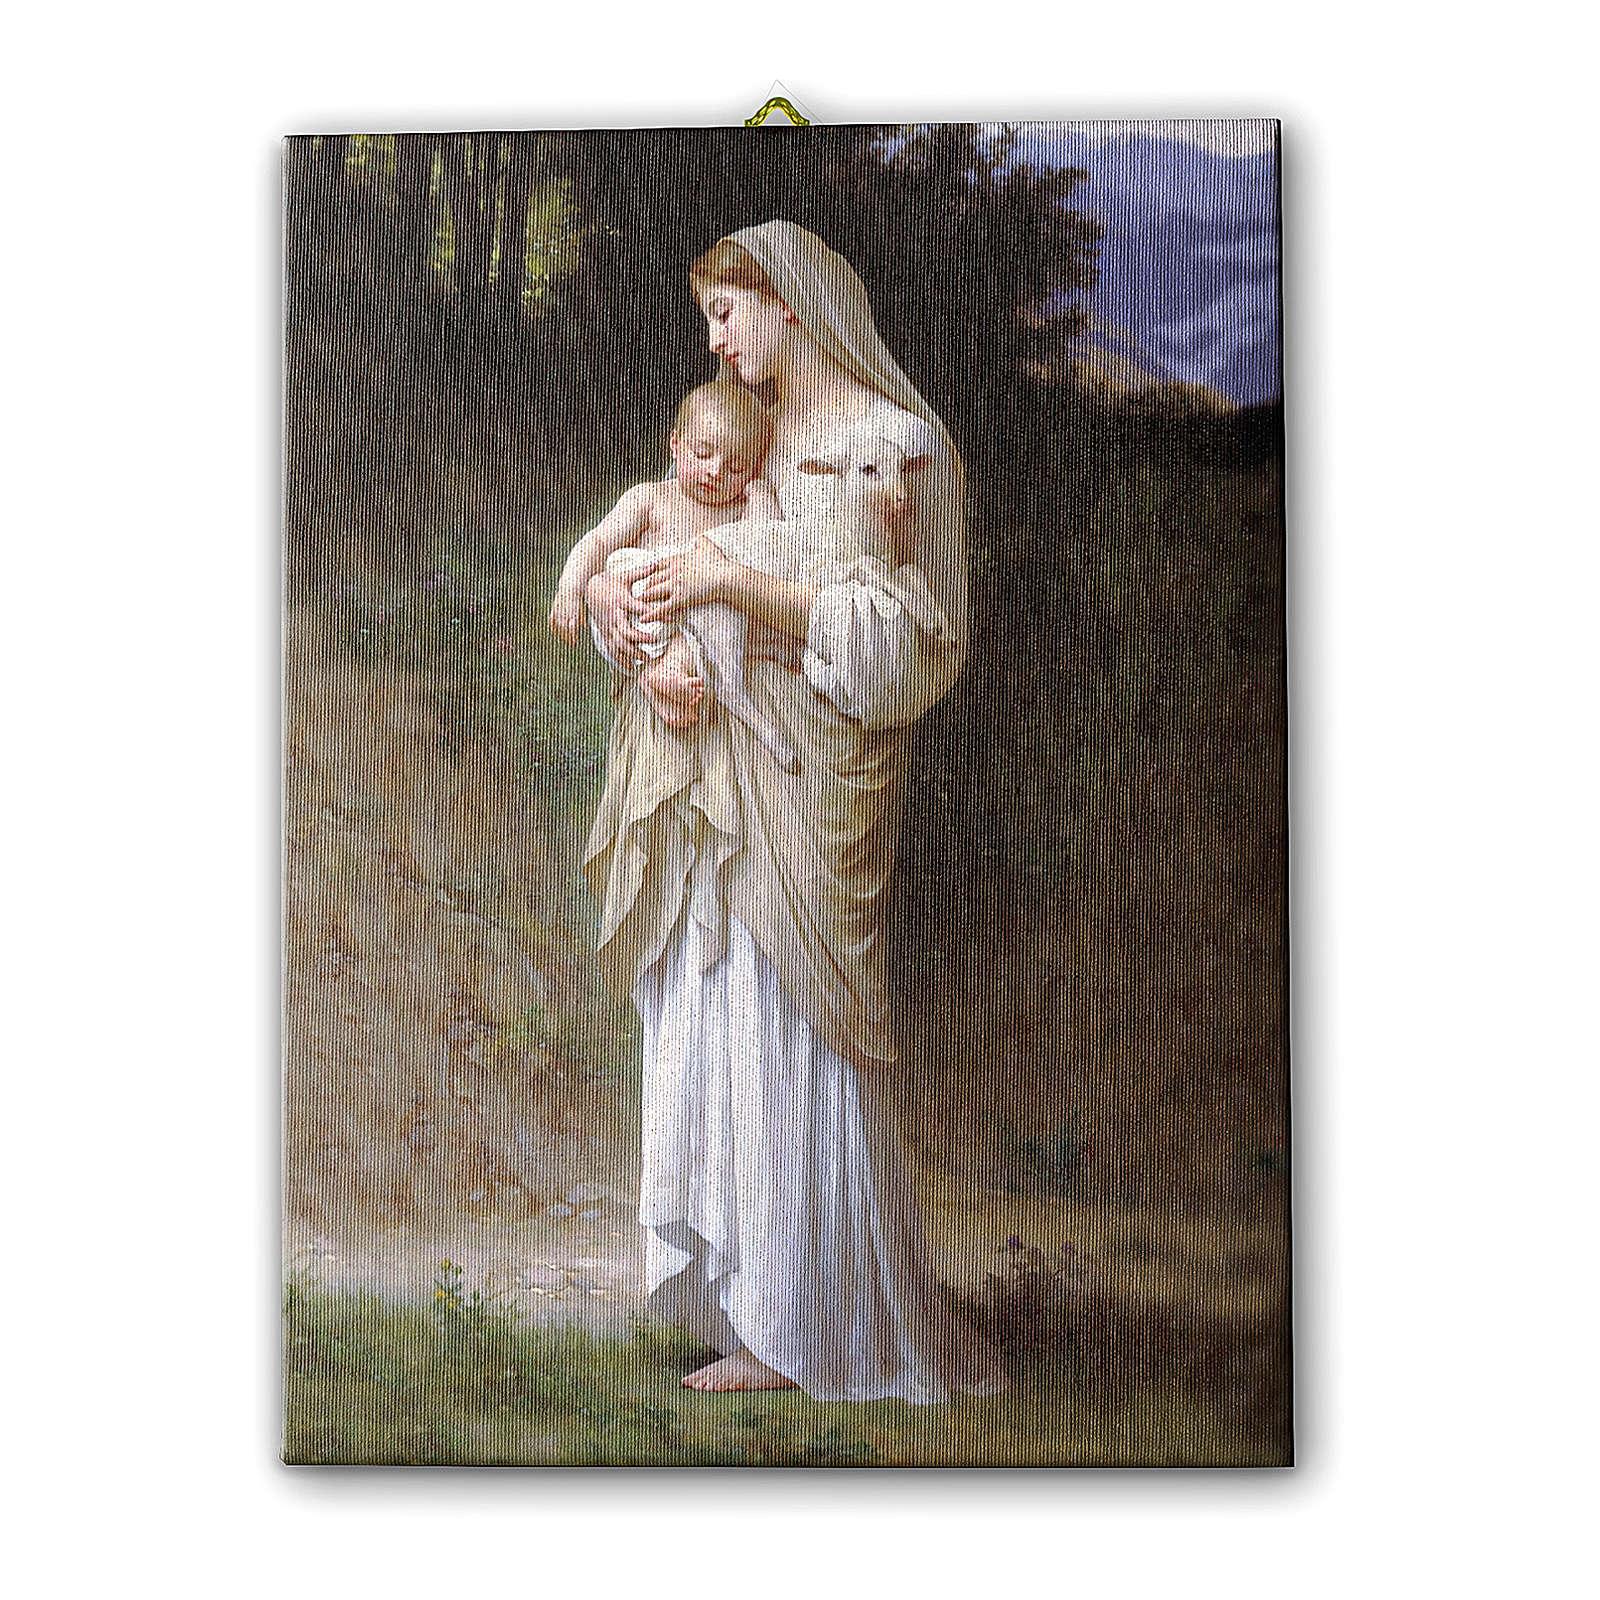 Quadro su tela pittorica Divina Innocenza di Bouguereau 40x30 cm 3